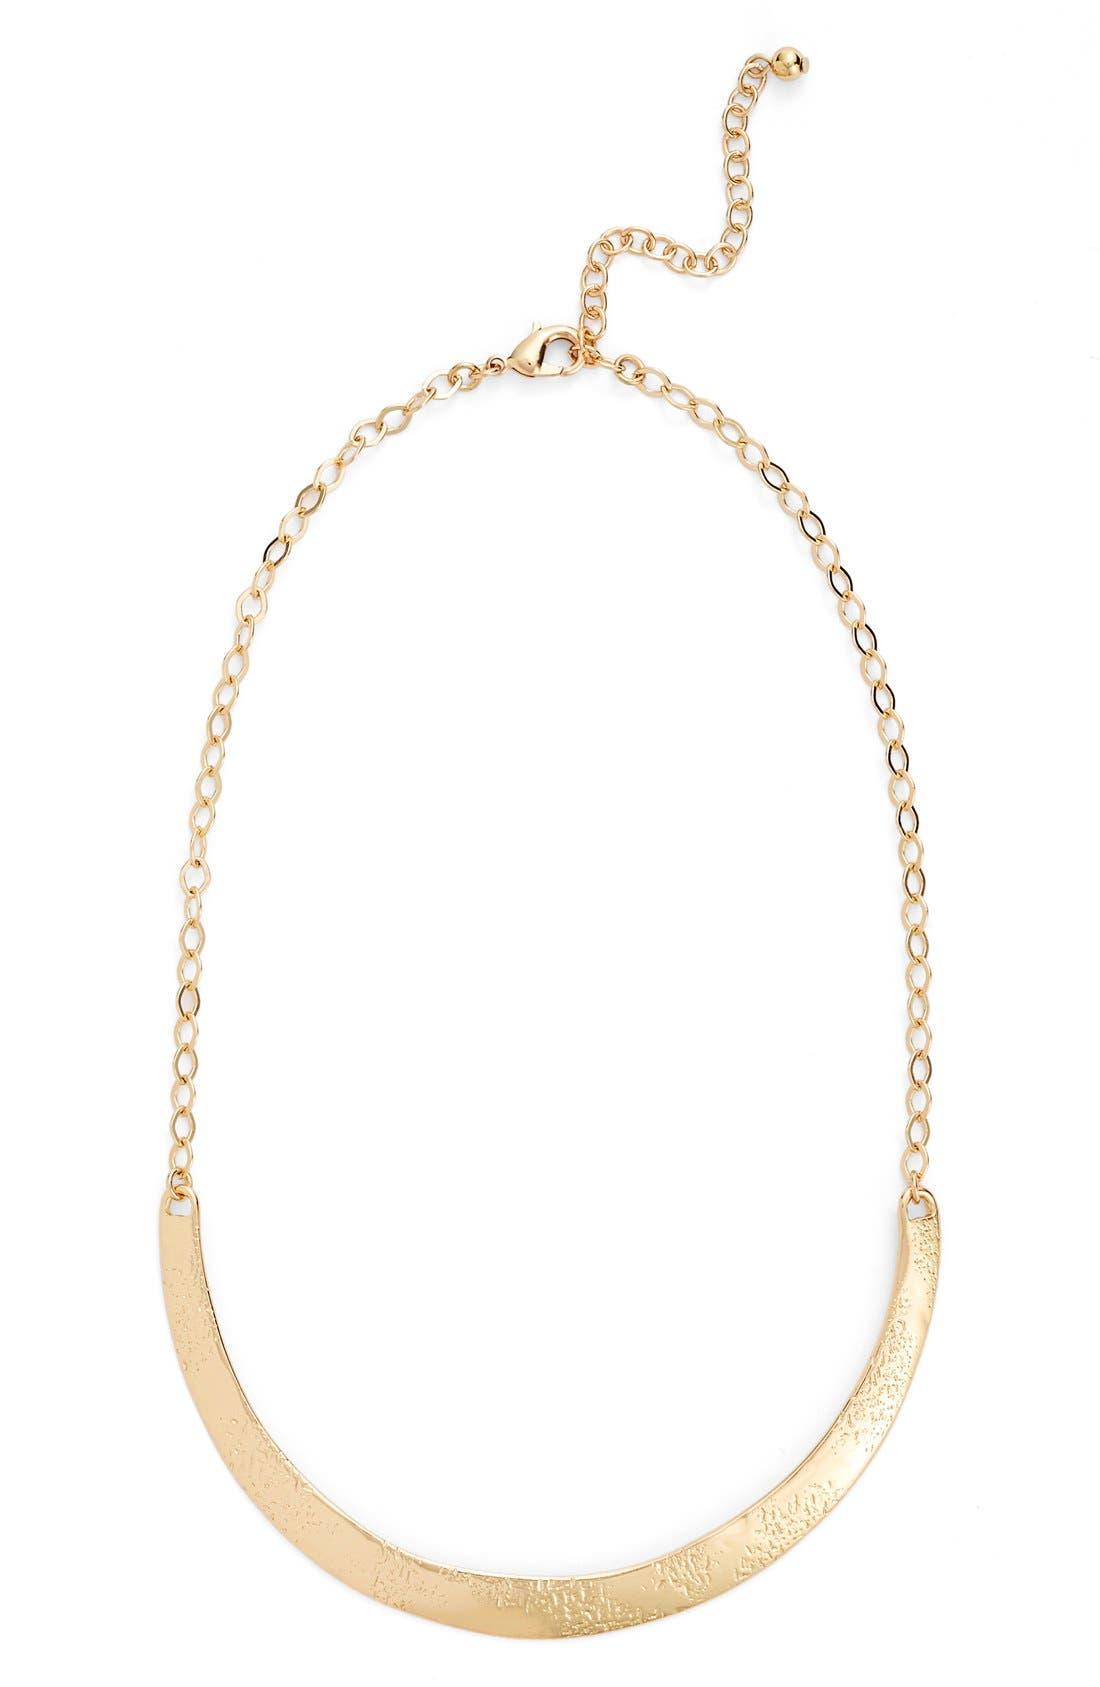 Alternate Image 1 Selected - Nordstrom Curve Bar Collar Necklace